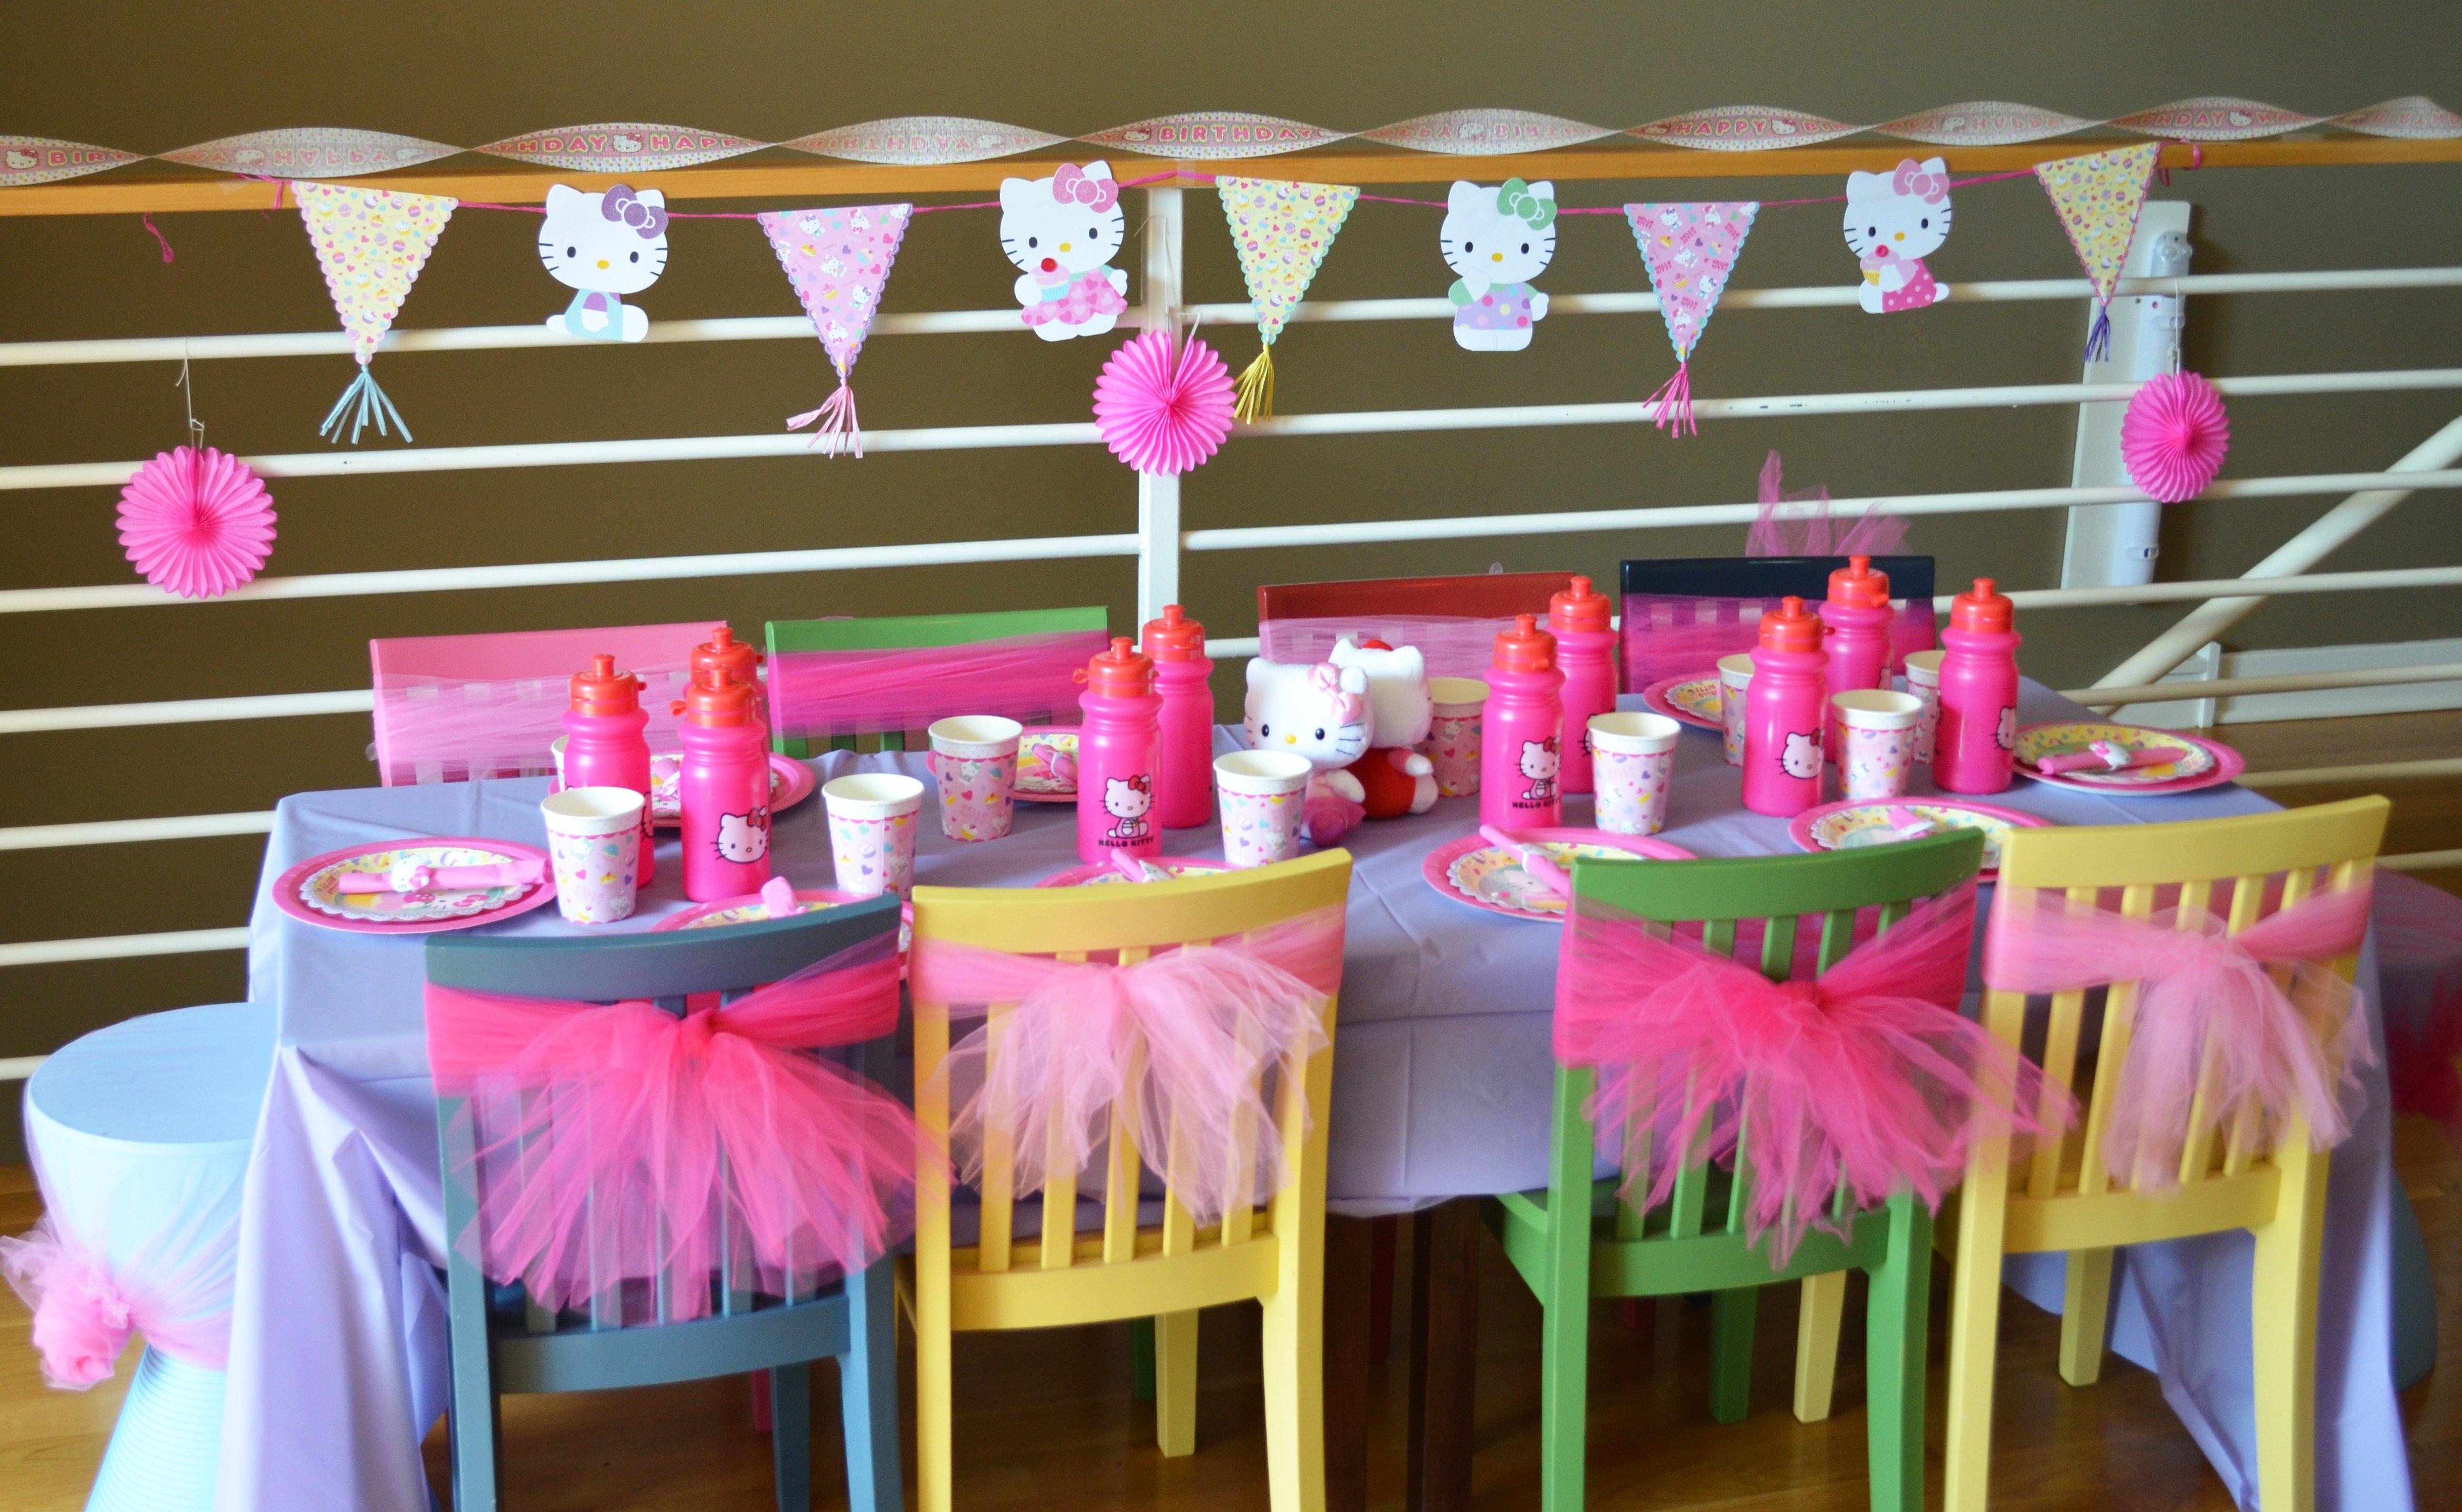 10 Most Popular Birthday Party Ideas For 10 Yr Old Girl a how to hello kitty birthday party hello kitty birthday hello 3